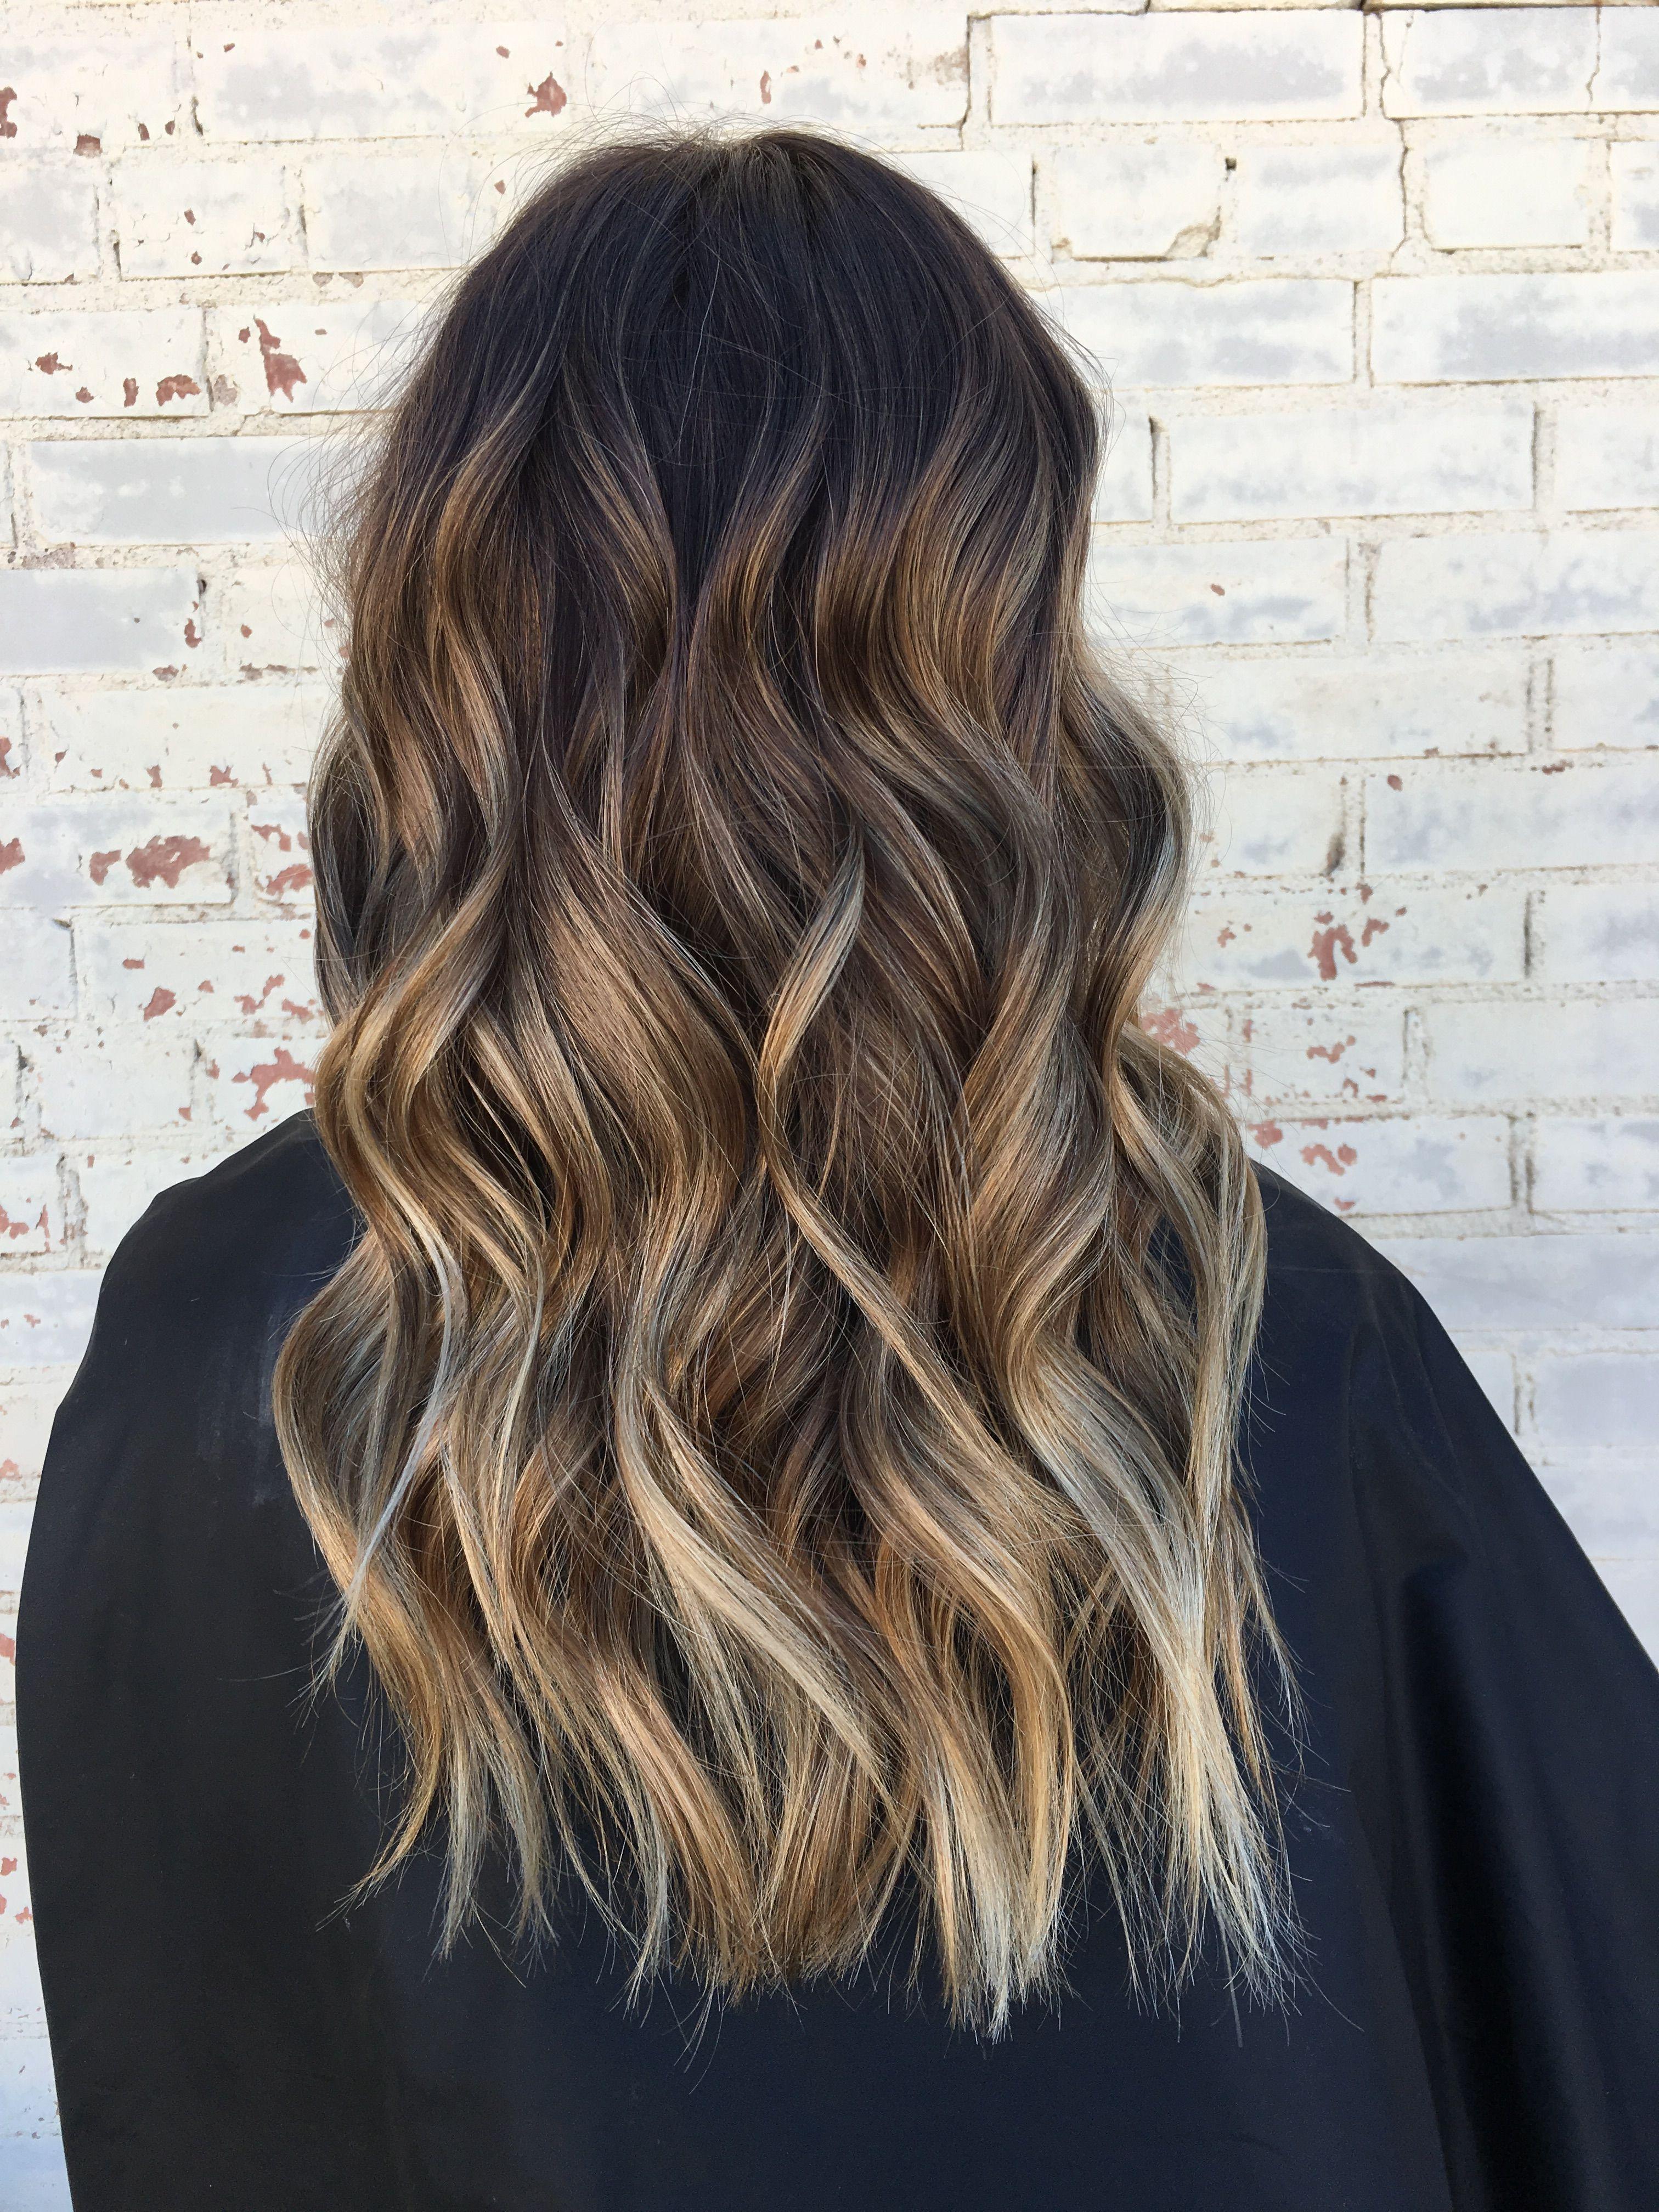 Brown Hair Brown Balayage Blonde Highlights Loose Waves